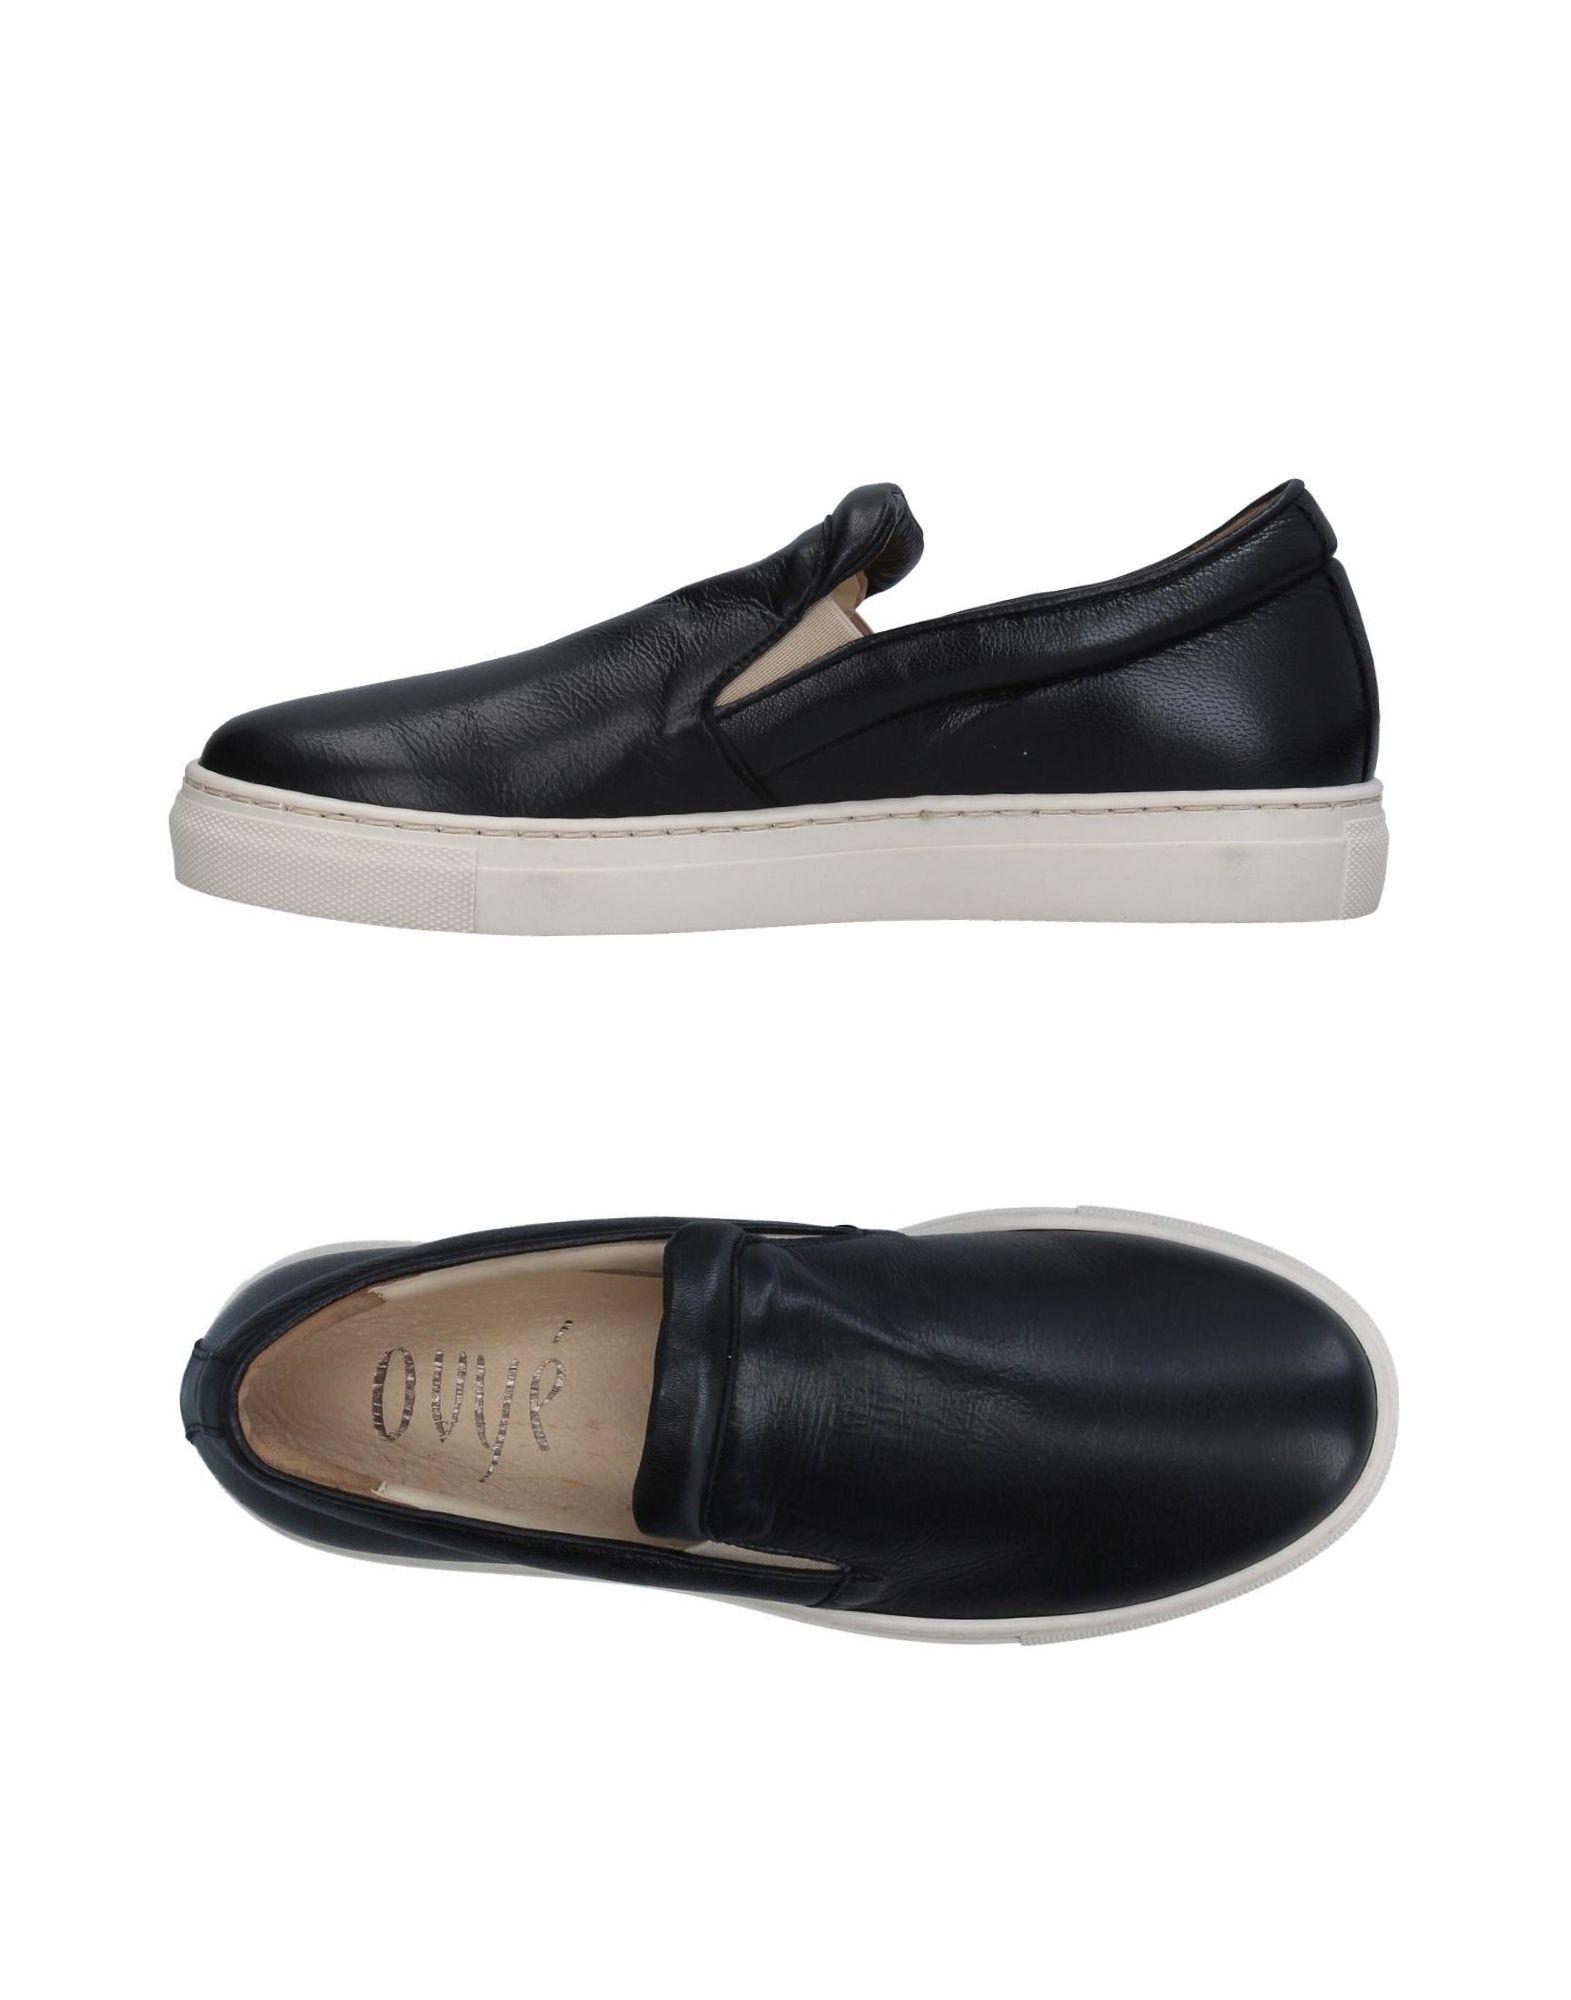 Ovye' By Cristina Lucchi Sneakers Damen  11333112WD Gute Qualität beliebte Schuhe